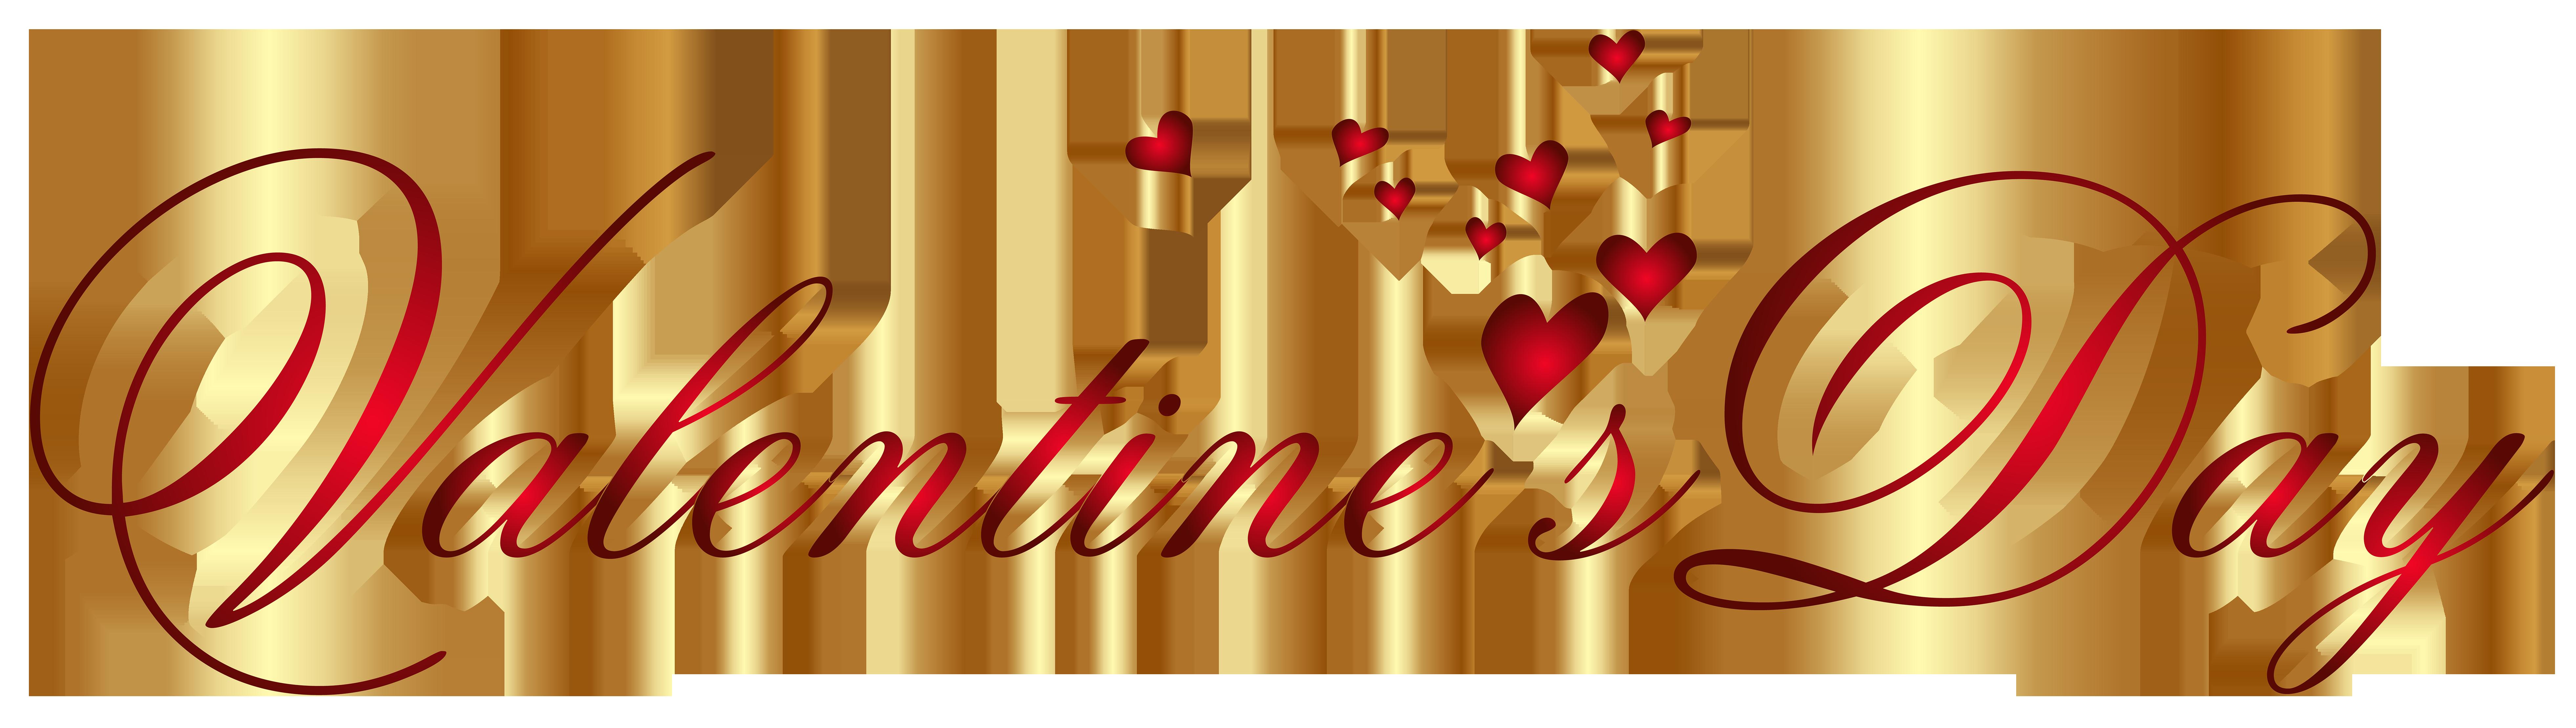 Valentine's Day Transparent PNG Clip Art Image.